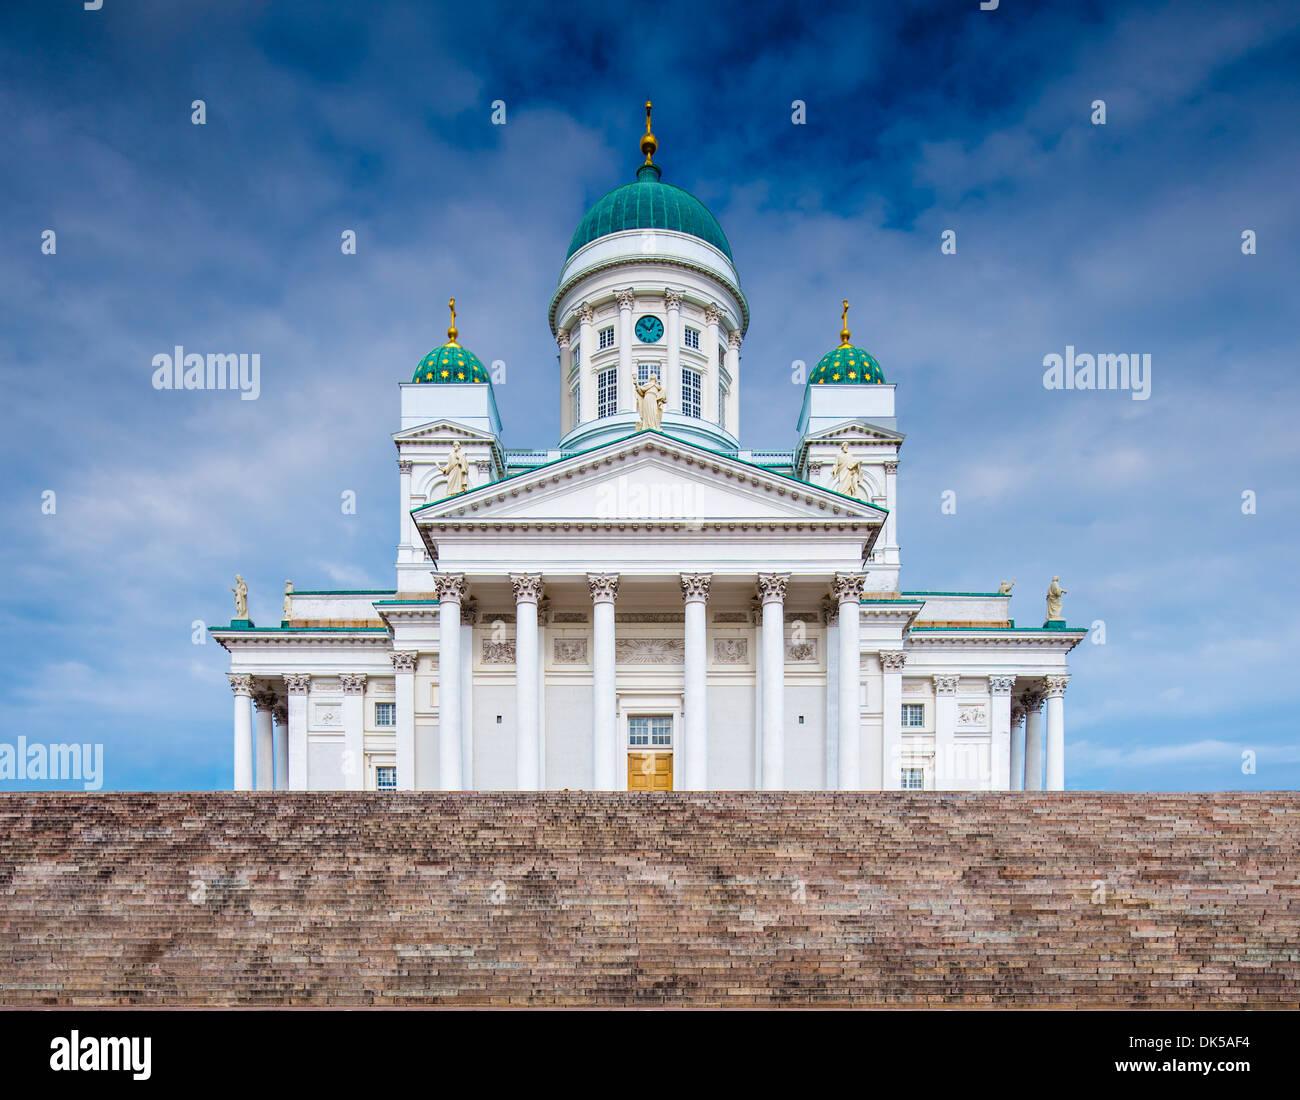 La Cattedrale di Helsinki in Helskini, Finlandia. Immagini Stock